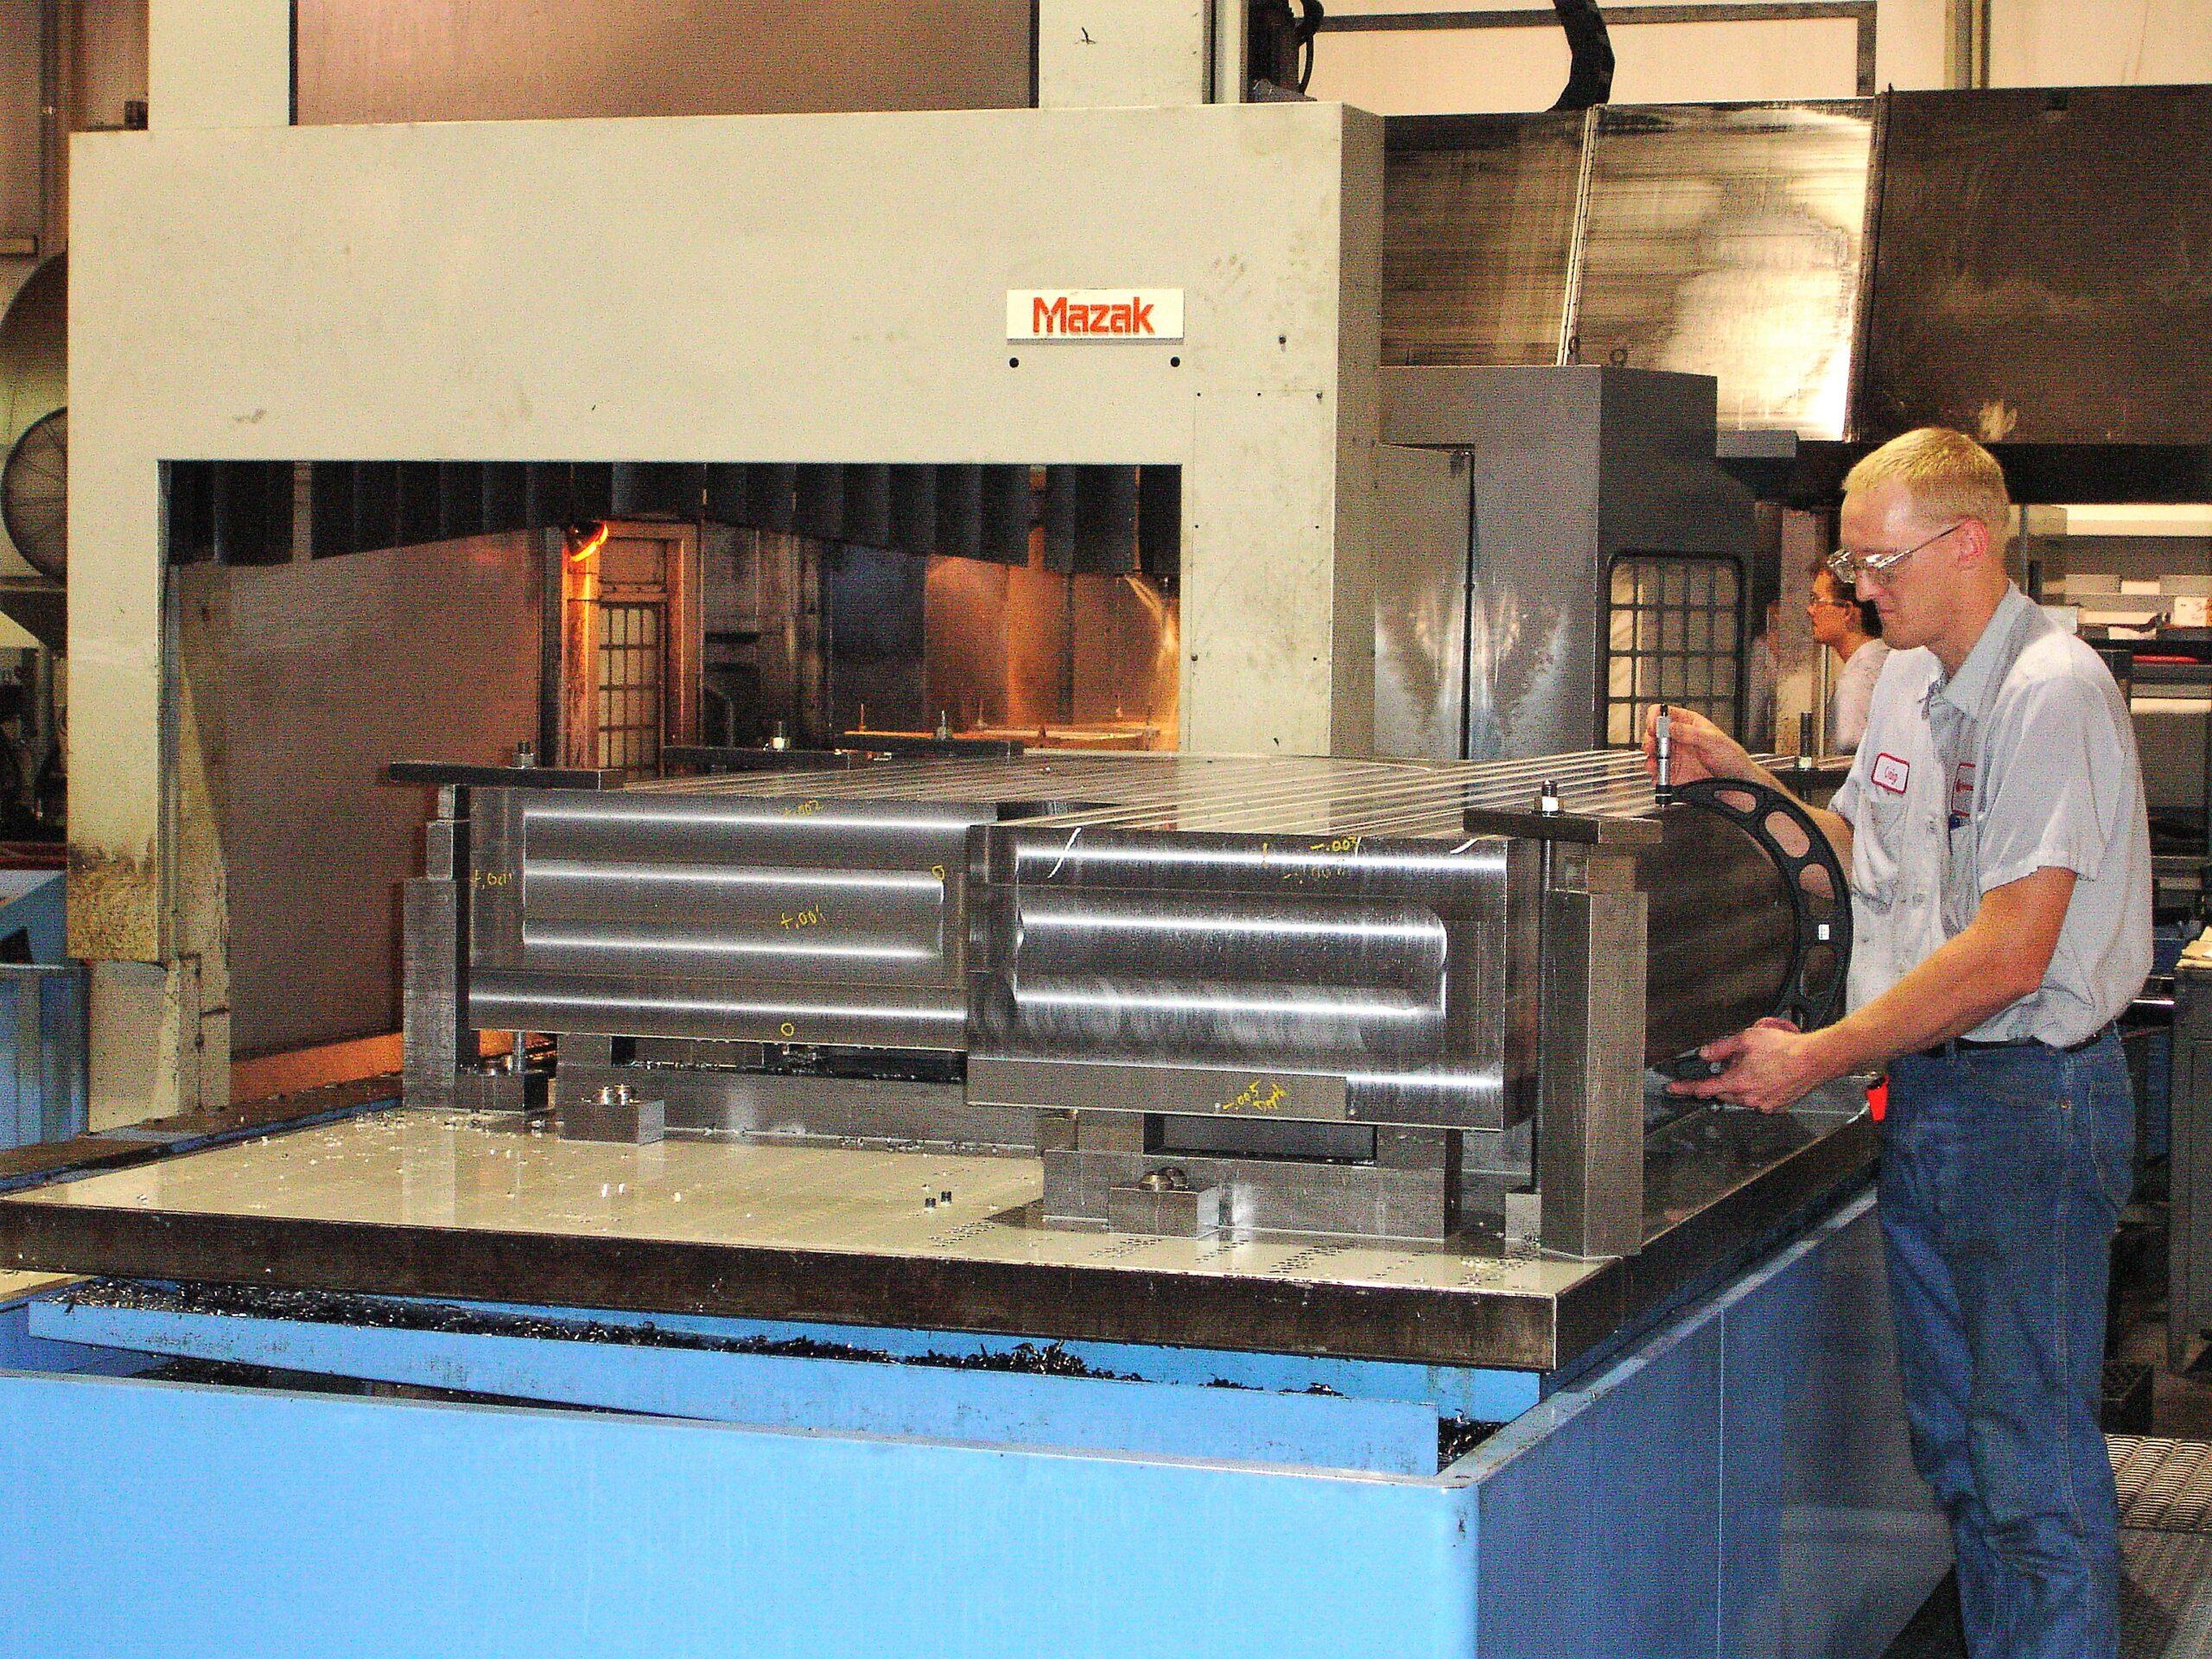 Mazak CNC Milling Machine with 15,000 Lbs part capacity